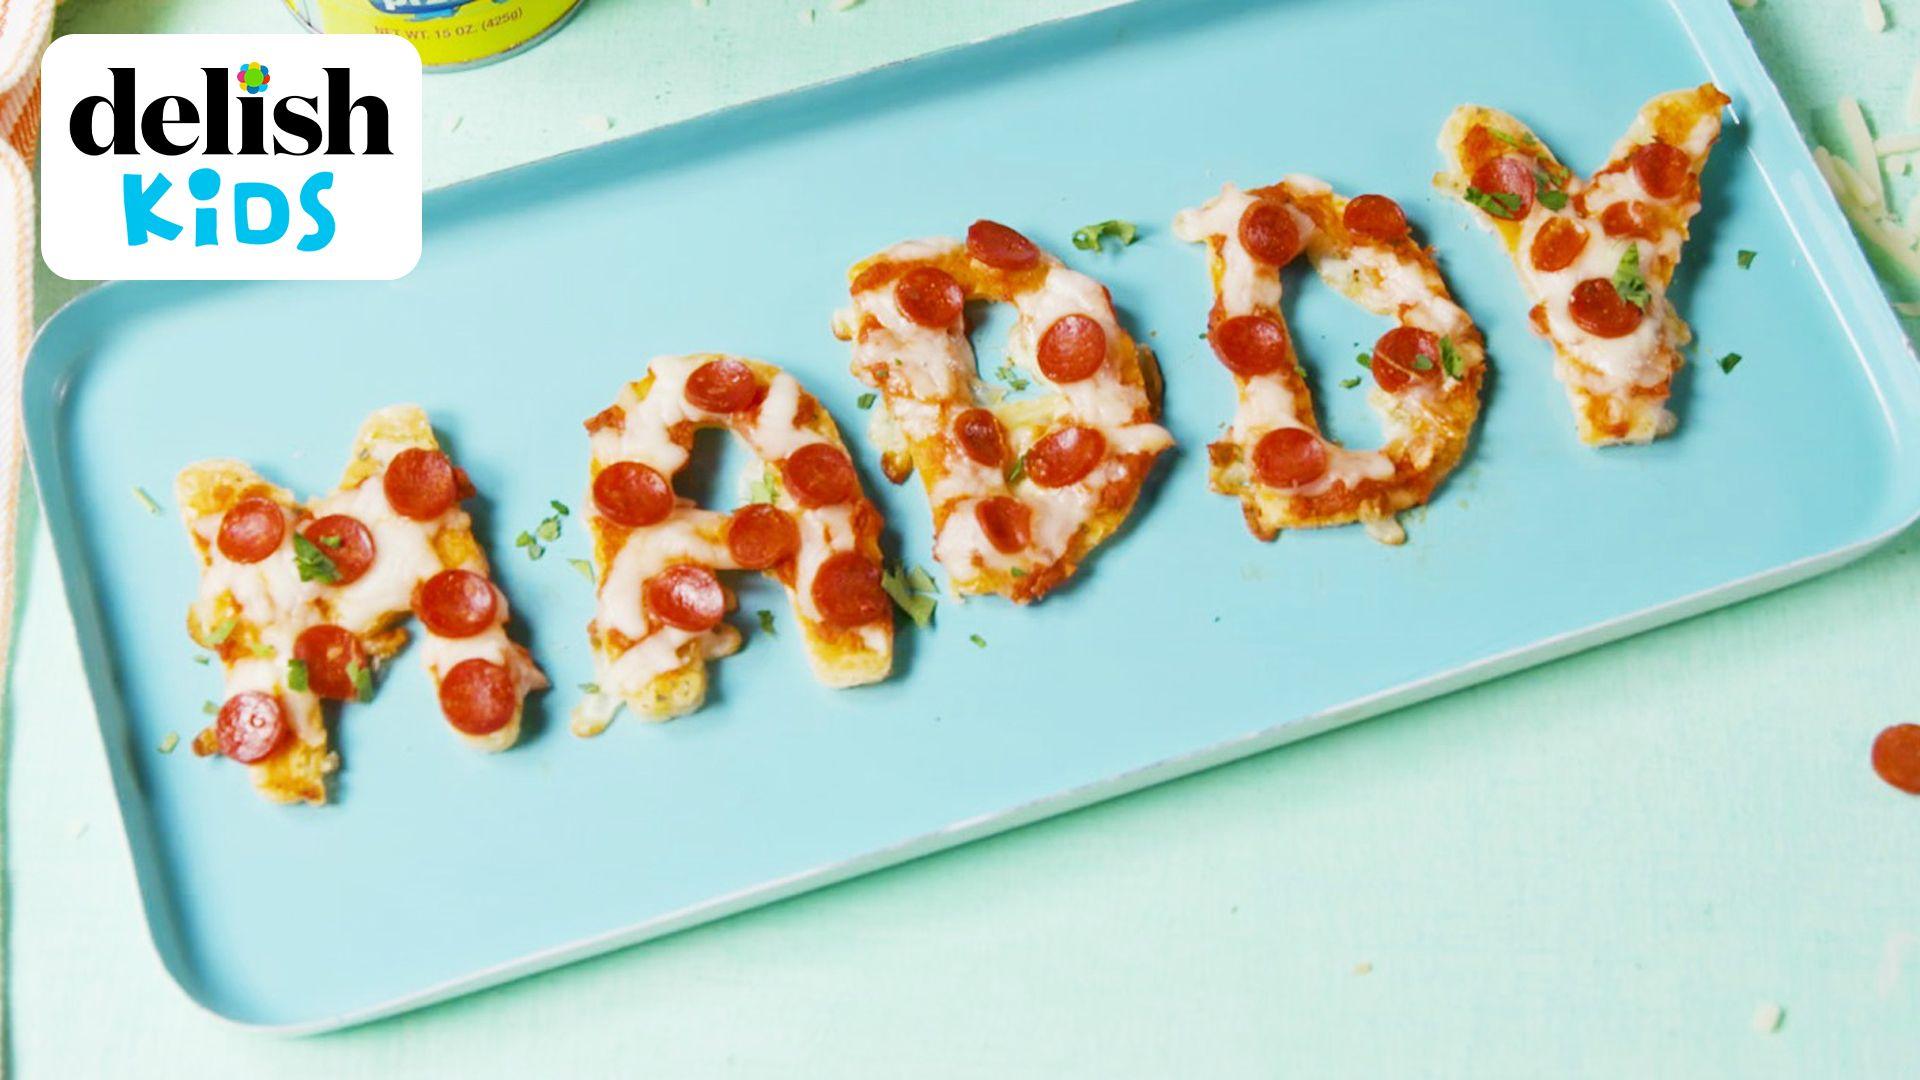 Best Alphabet Pizza Video - How to Make Alphabet Pizza Video